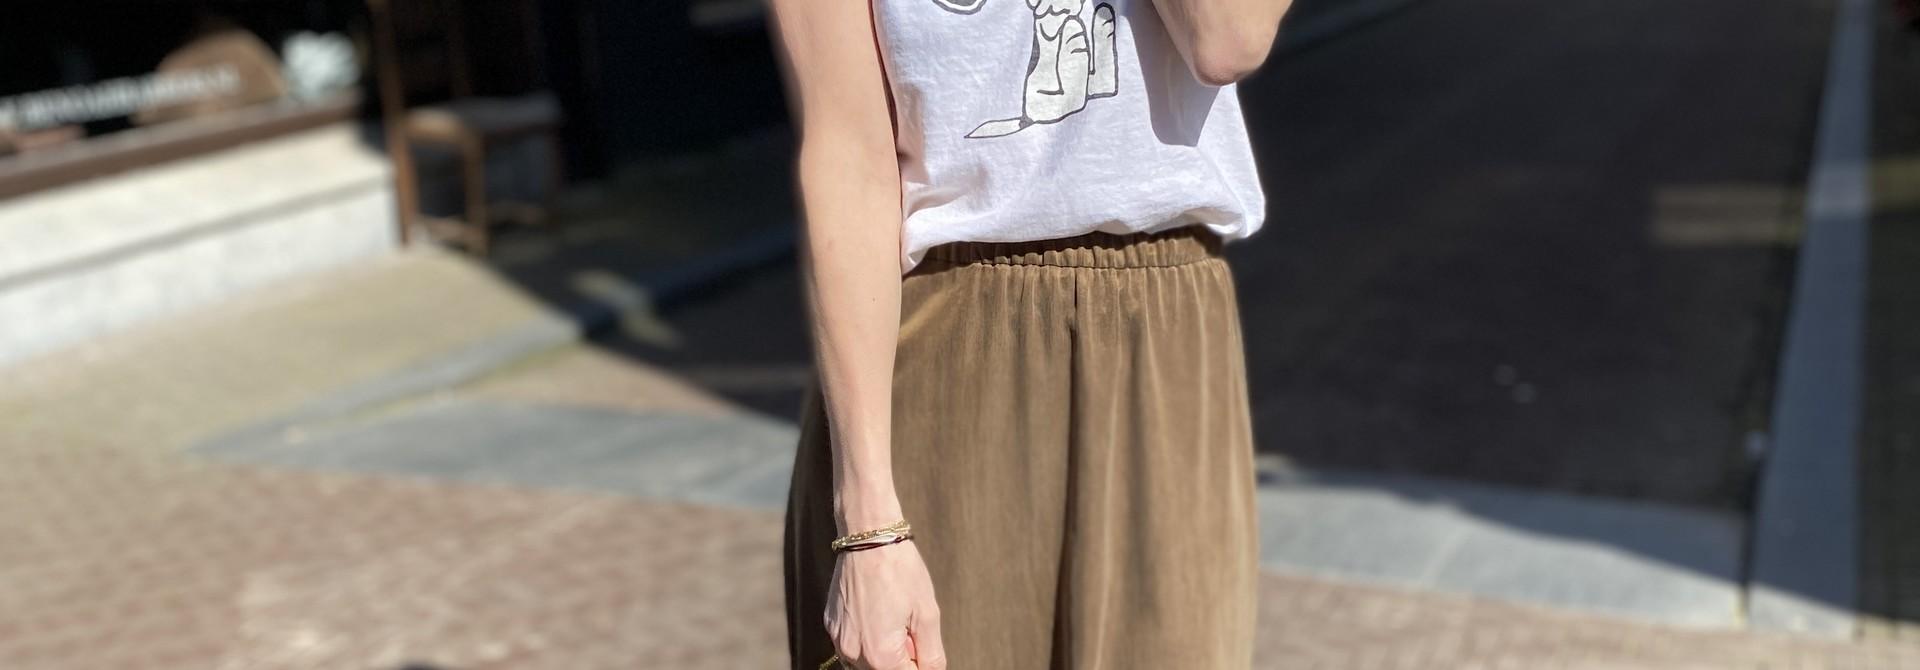 T-shirt Vintage Snoopy